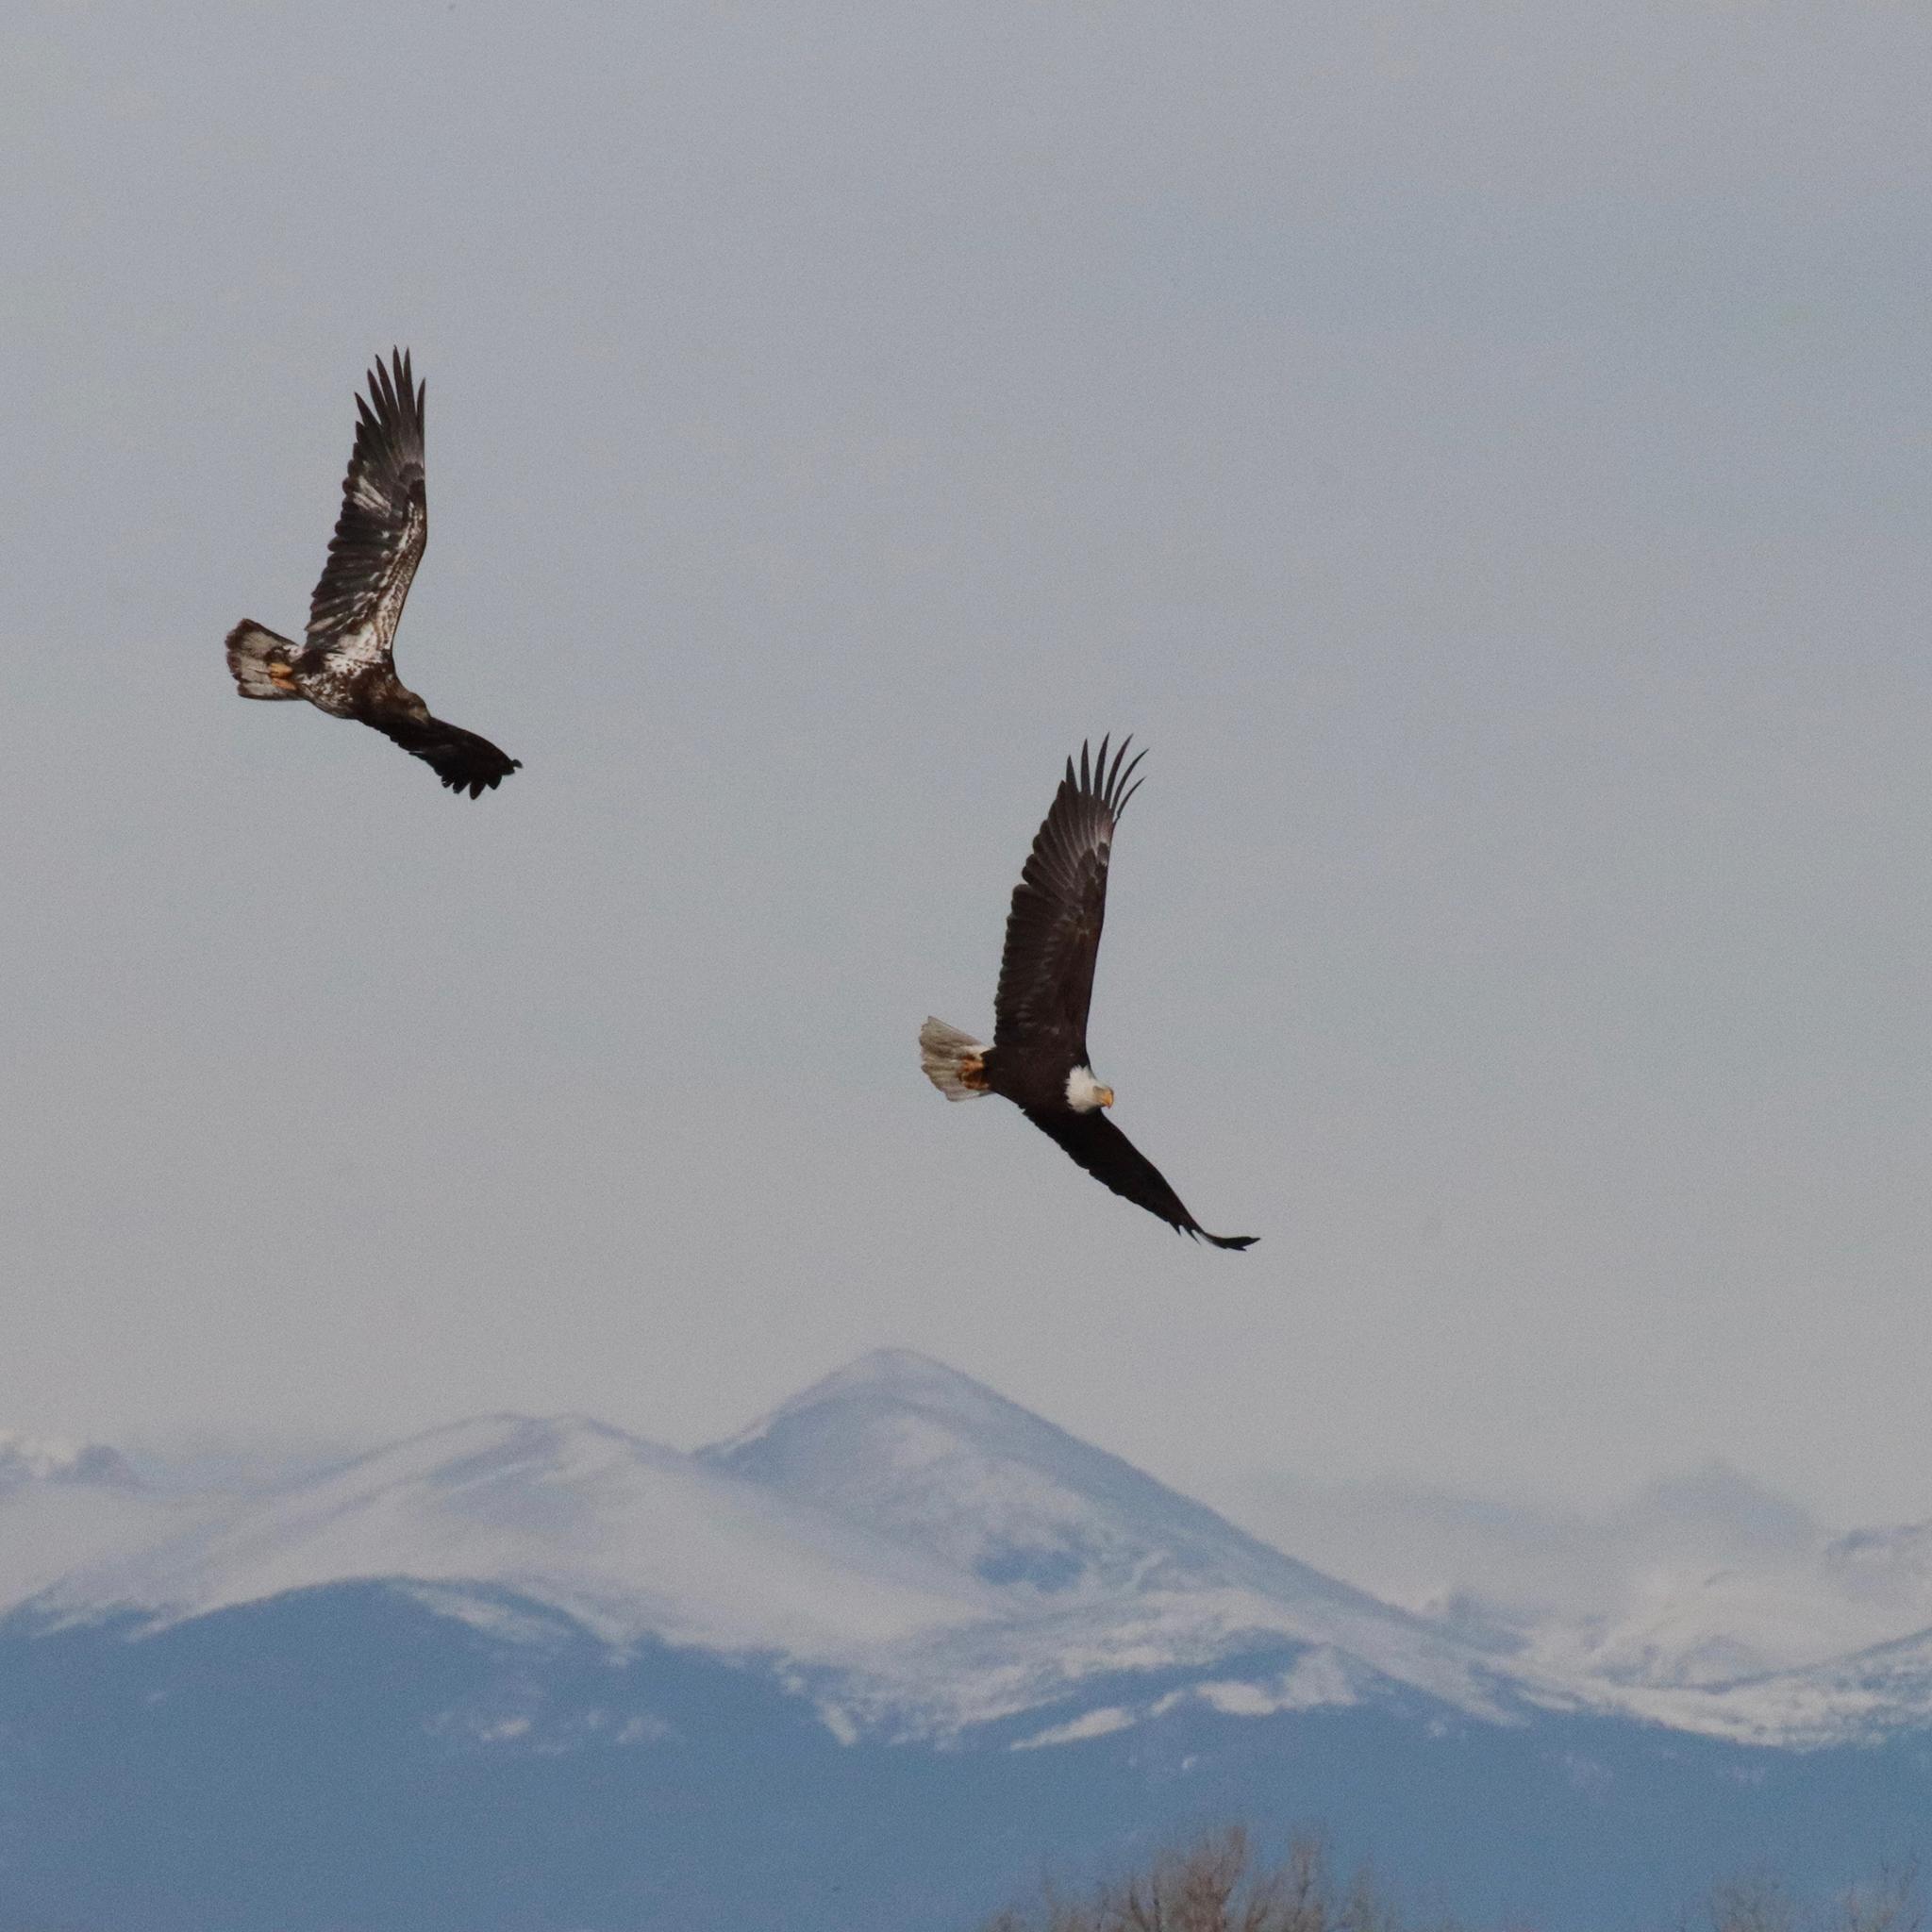 Juvenile and adult eagle flying over Barr Lake